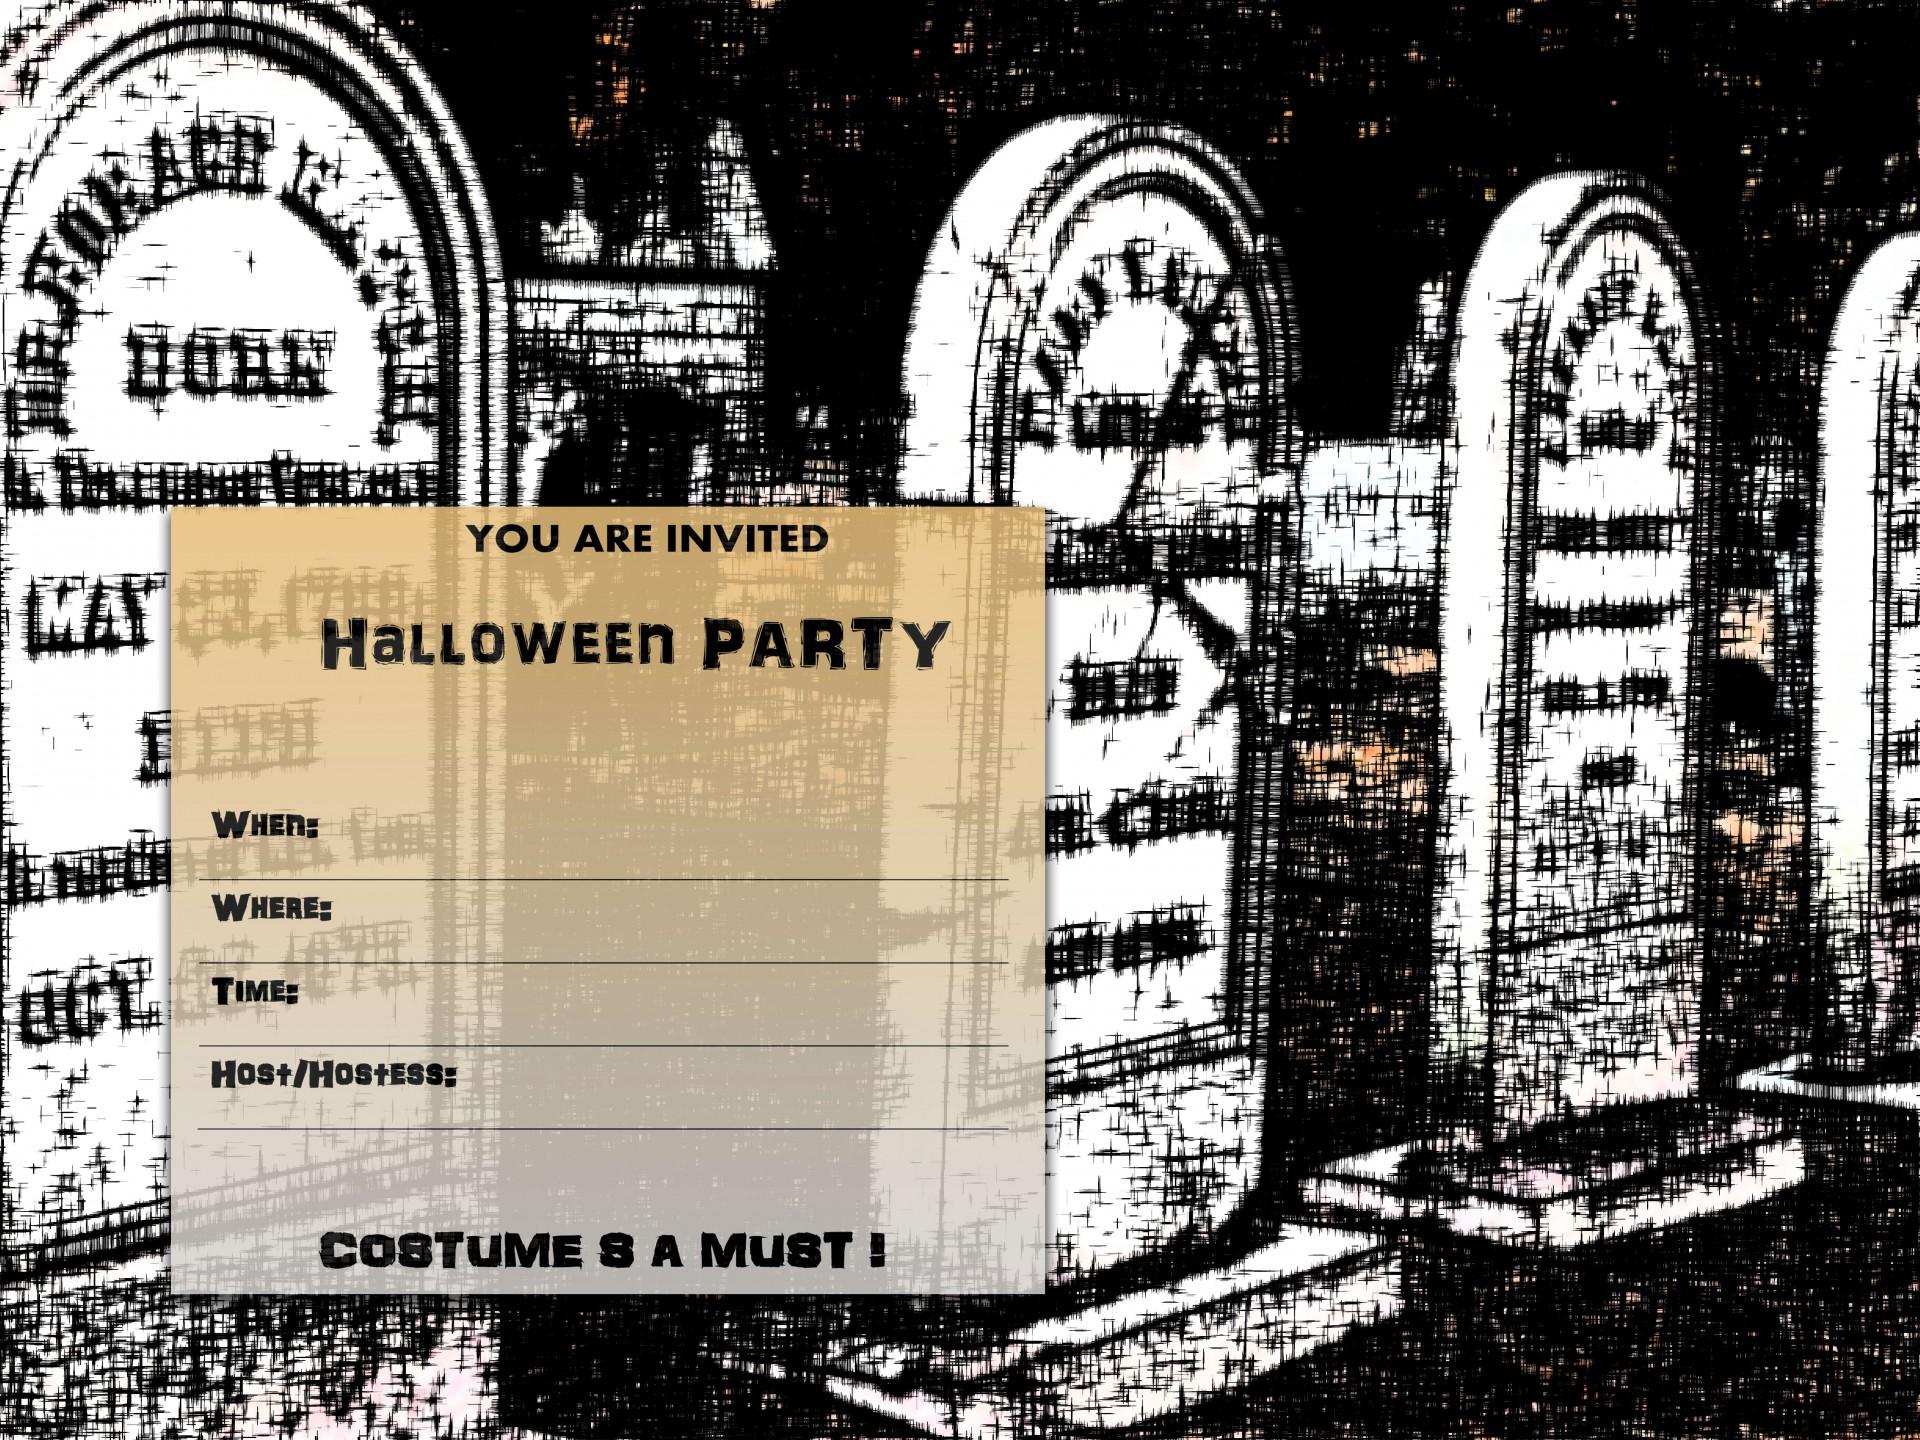 Party Invitation Halloween Black Orange Free Photo From Needpix Com